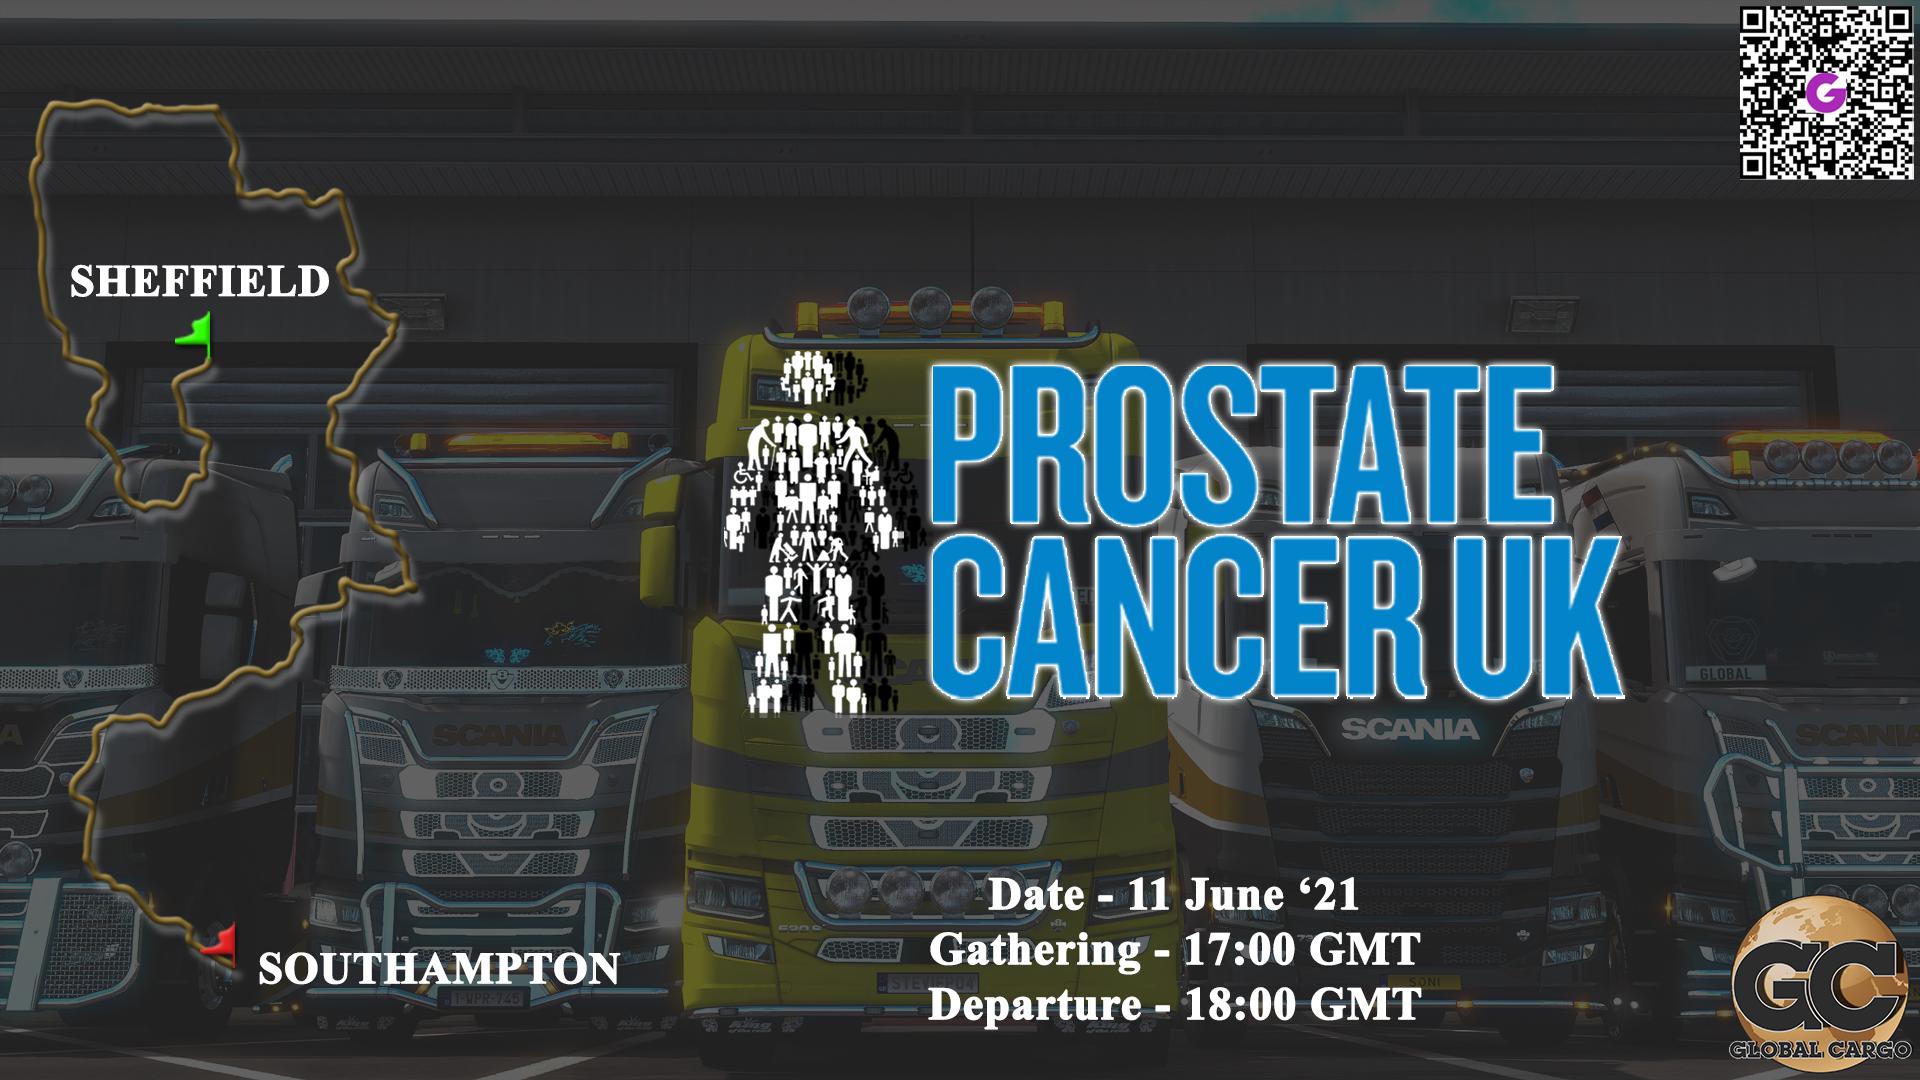 Global Cargo Prostate Cancer UK